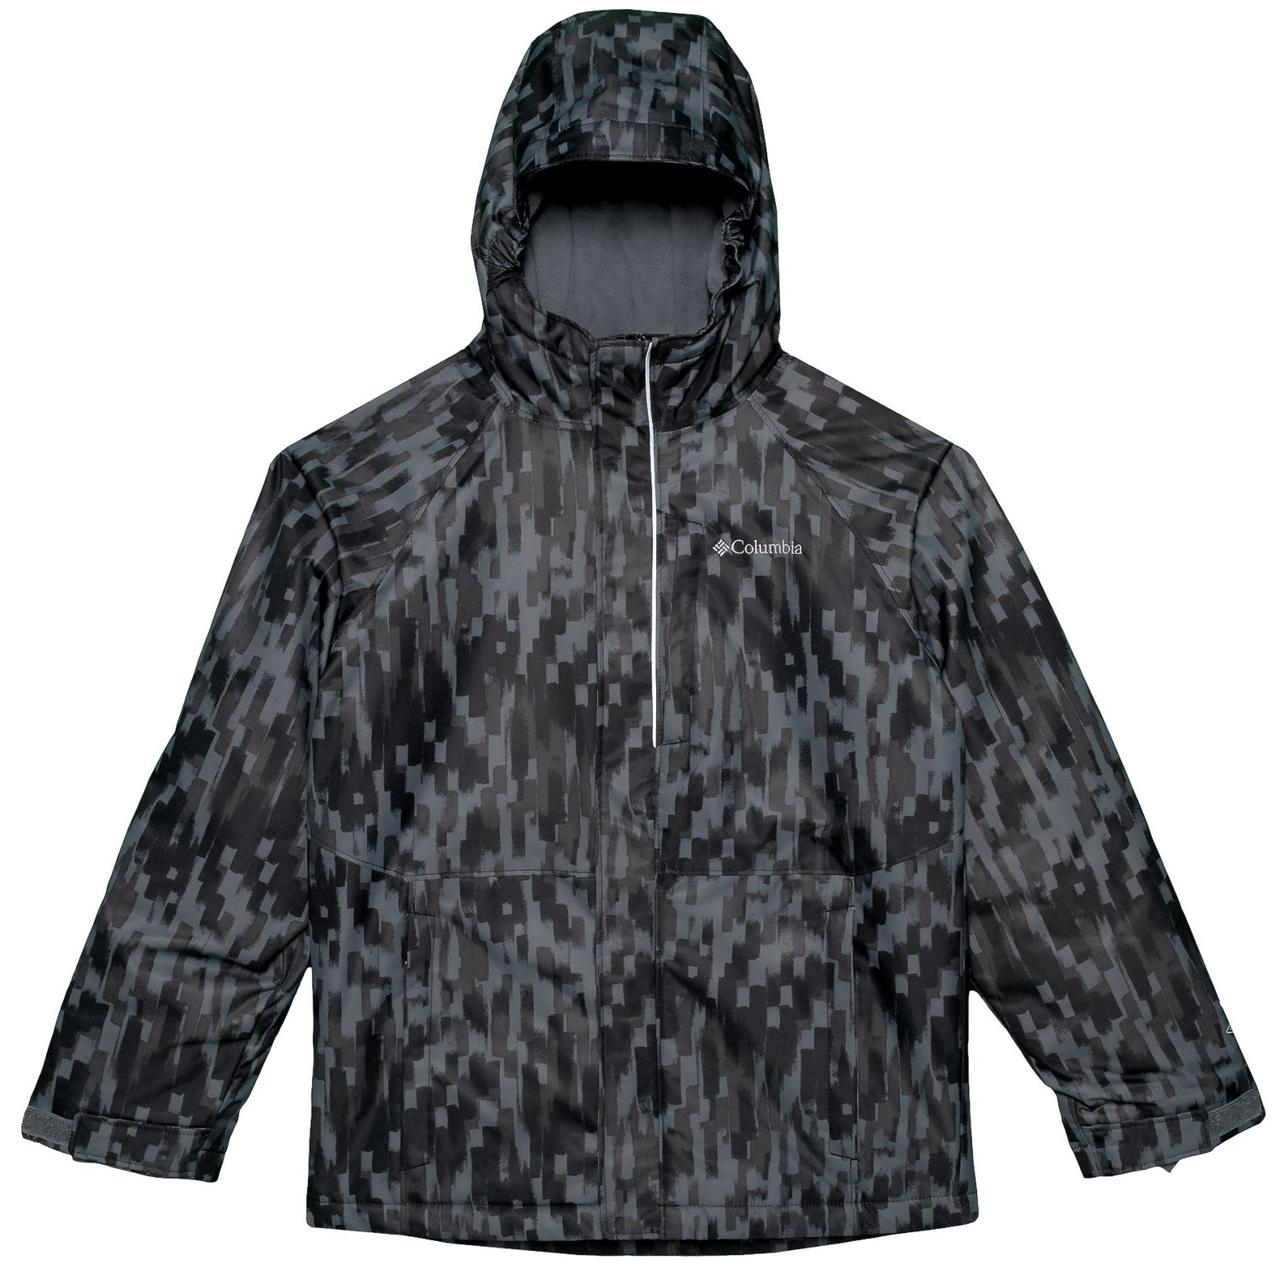 Зимняя куртка Columbia Direct Summit Omni-Tech Omni-Heat.